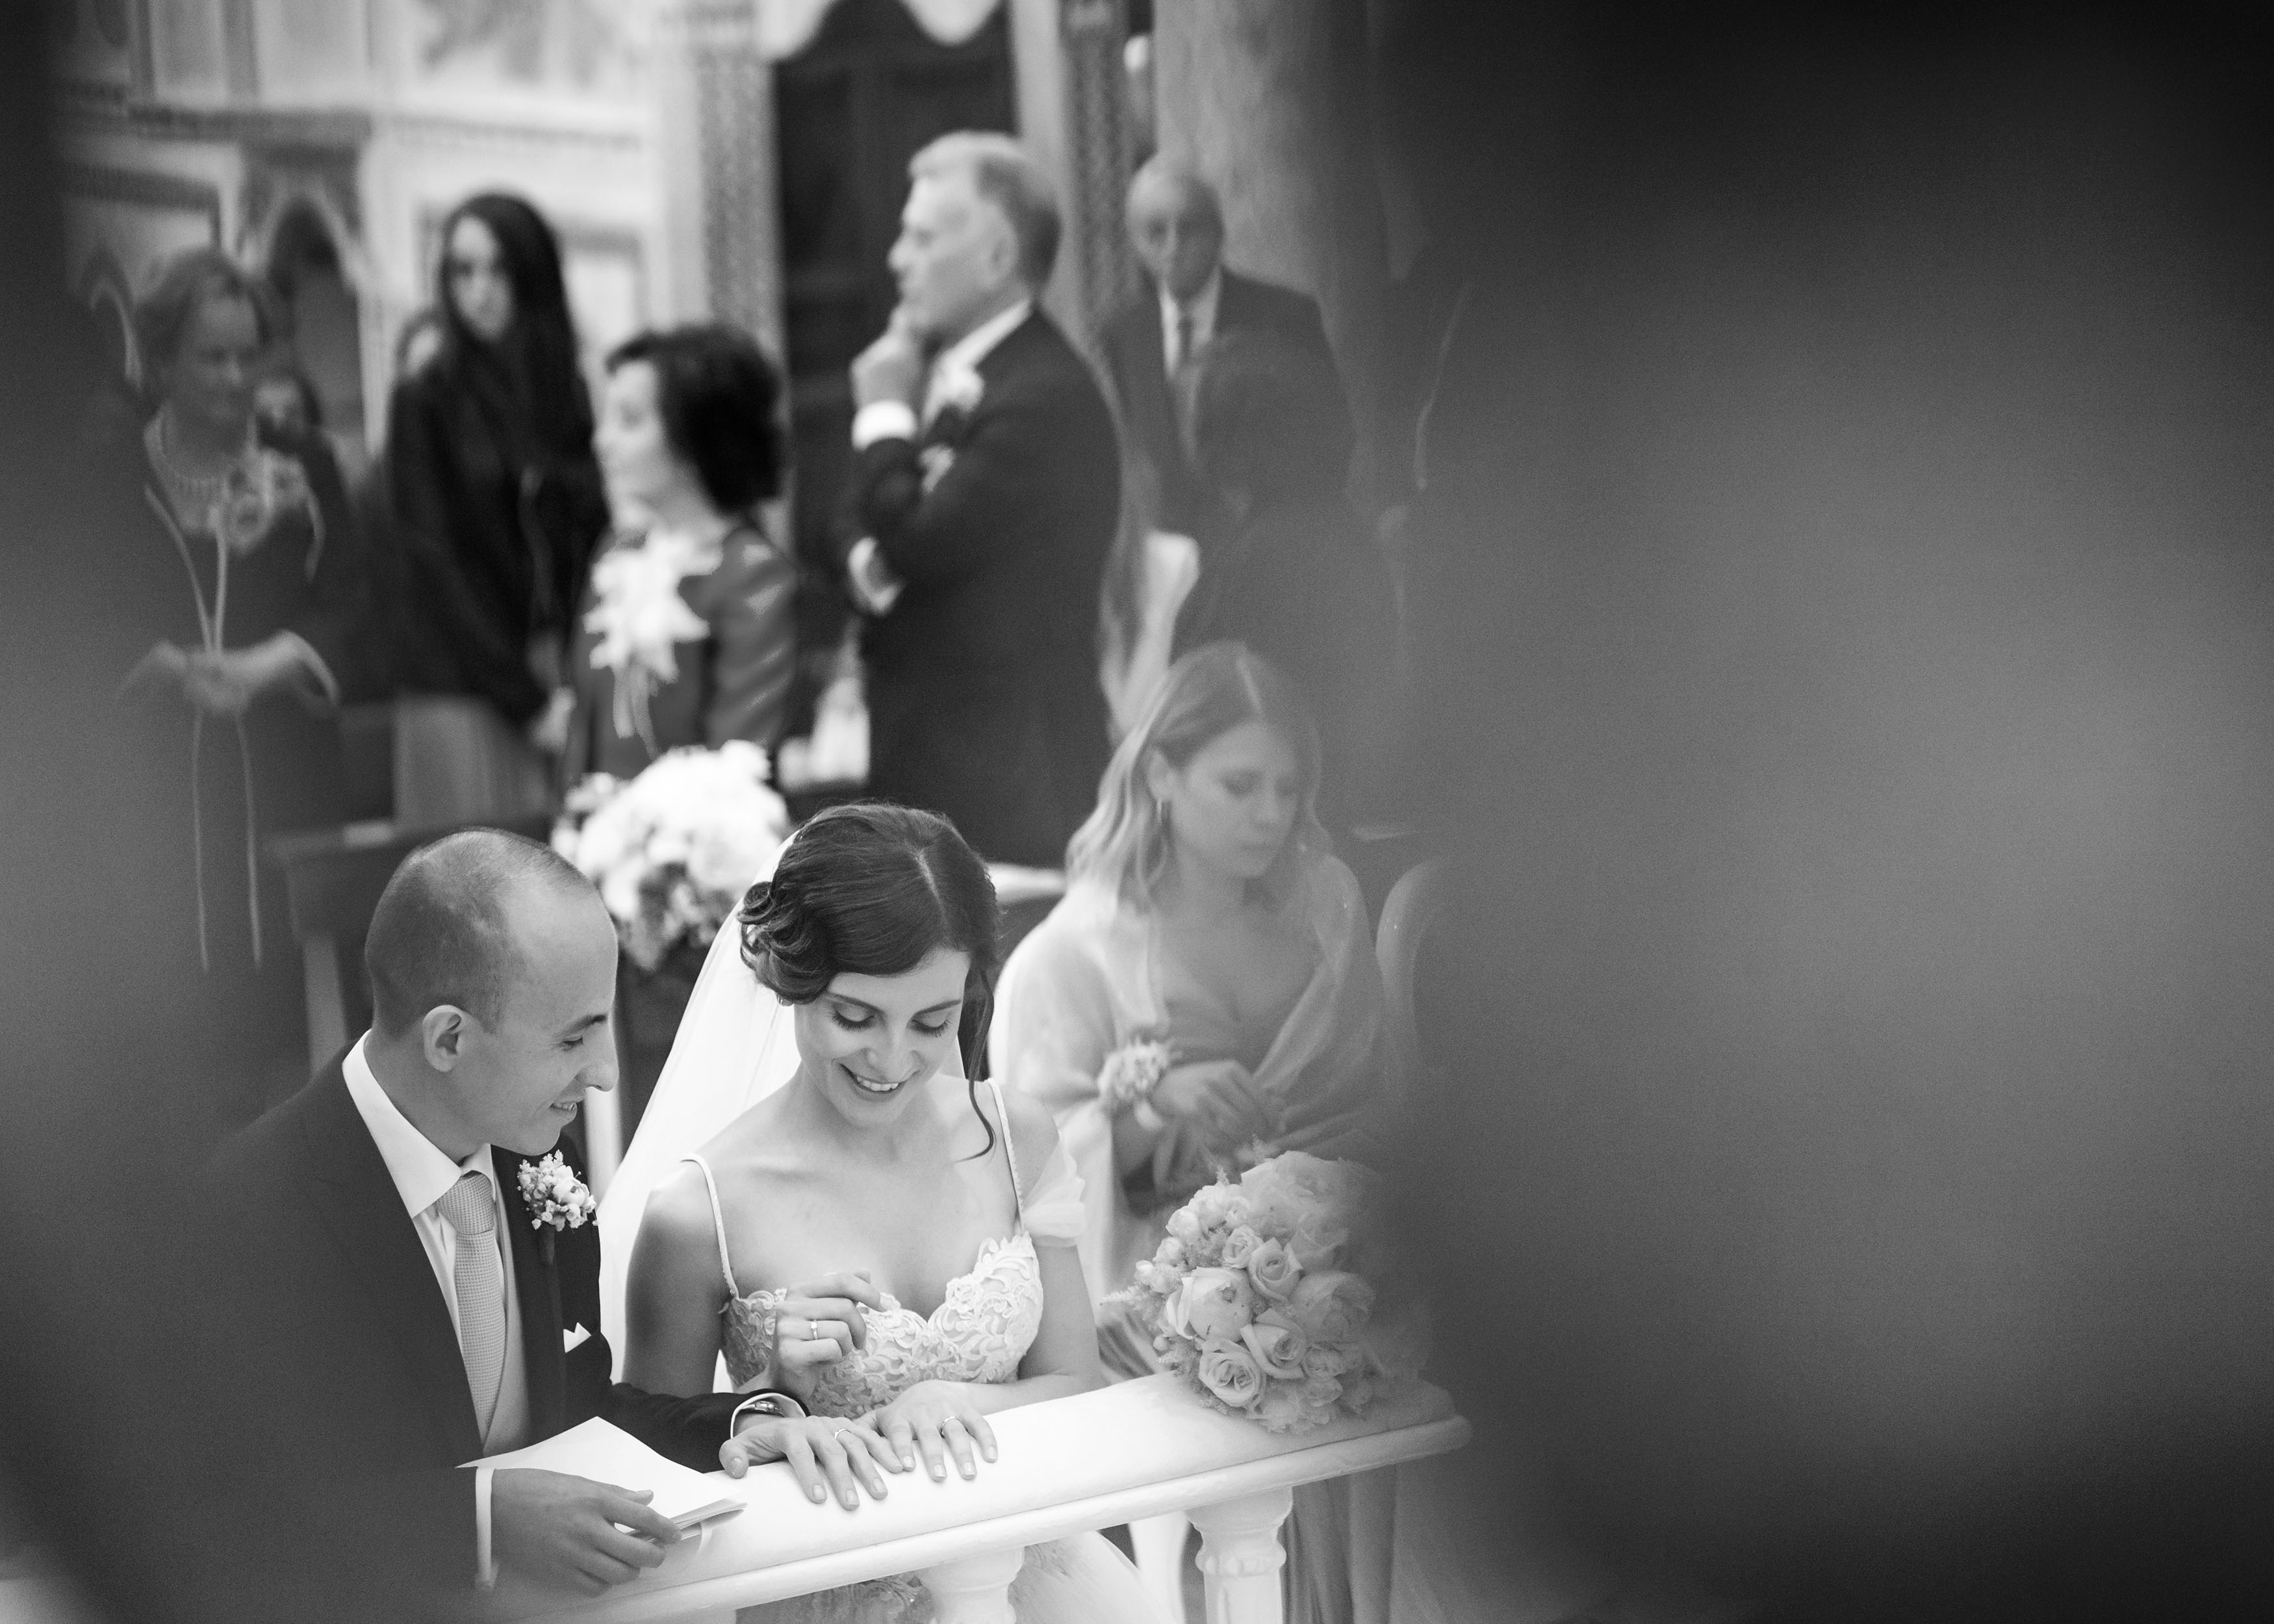 https://www.weddingamalfi.com/wp-content/uploads/Katia-Jorge-18-maggio-2019-27.jpg